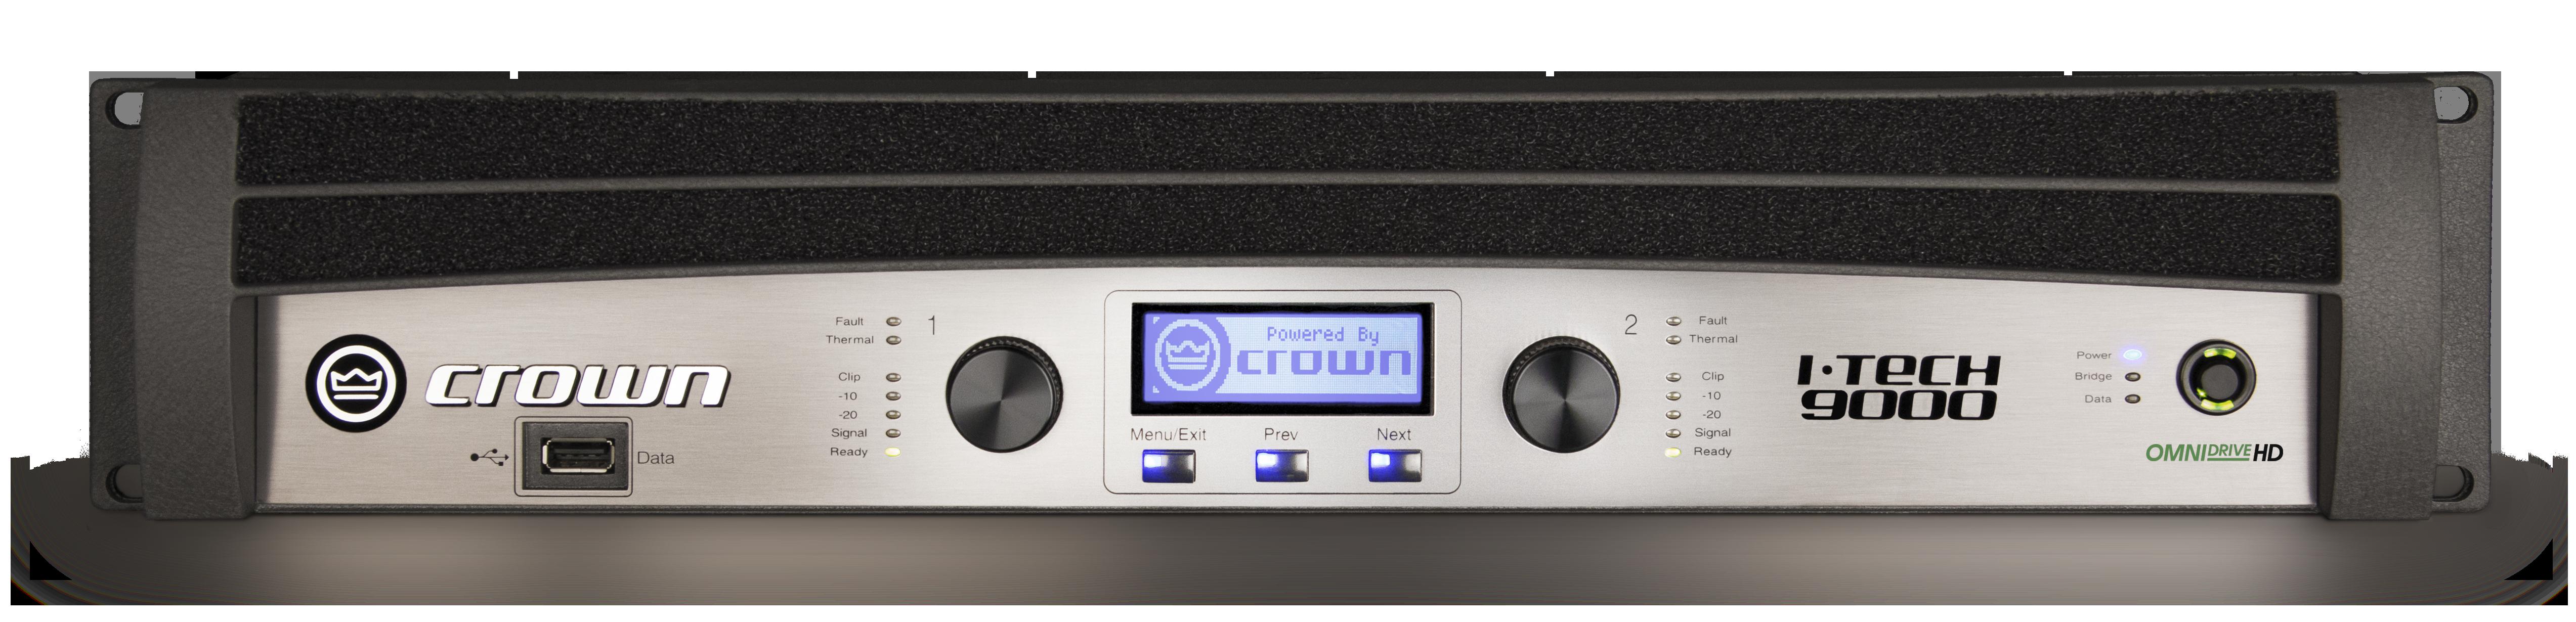 I Tech 9000hd Crown Audio Professional Power Amplifiers Amplifier Gt High Two Channel 3500w 4